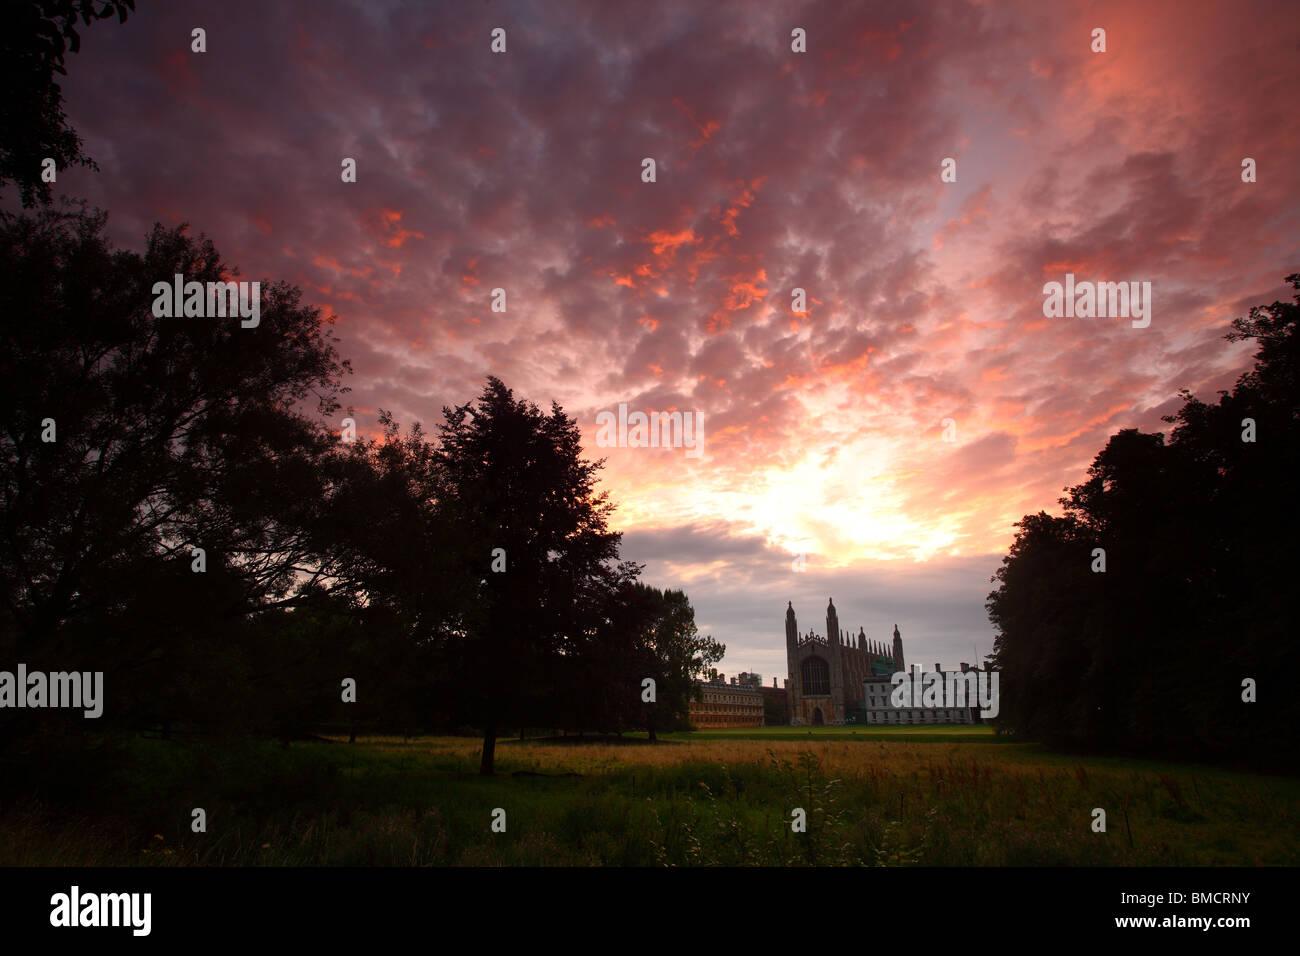 King's College, Cambridge University, from the Backs at sunrise - Stock Image